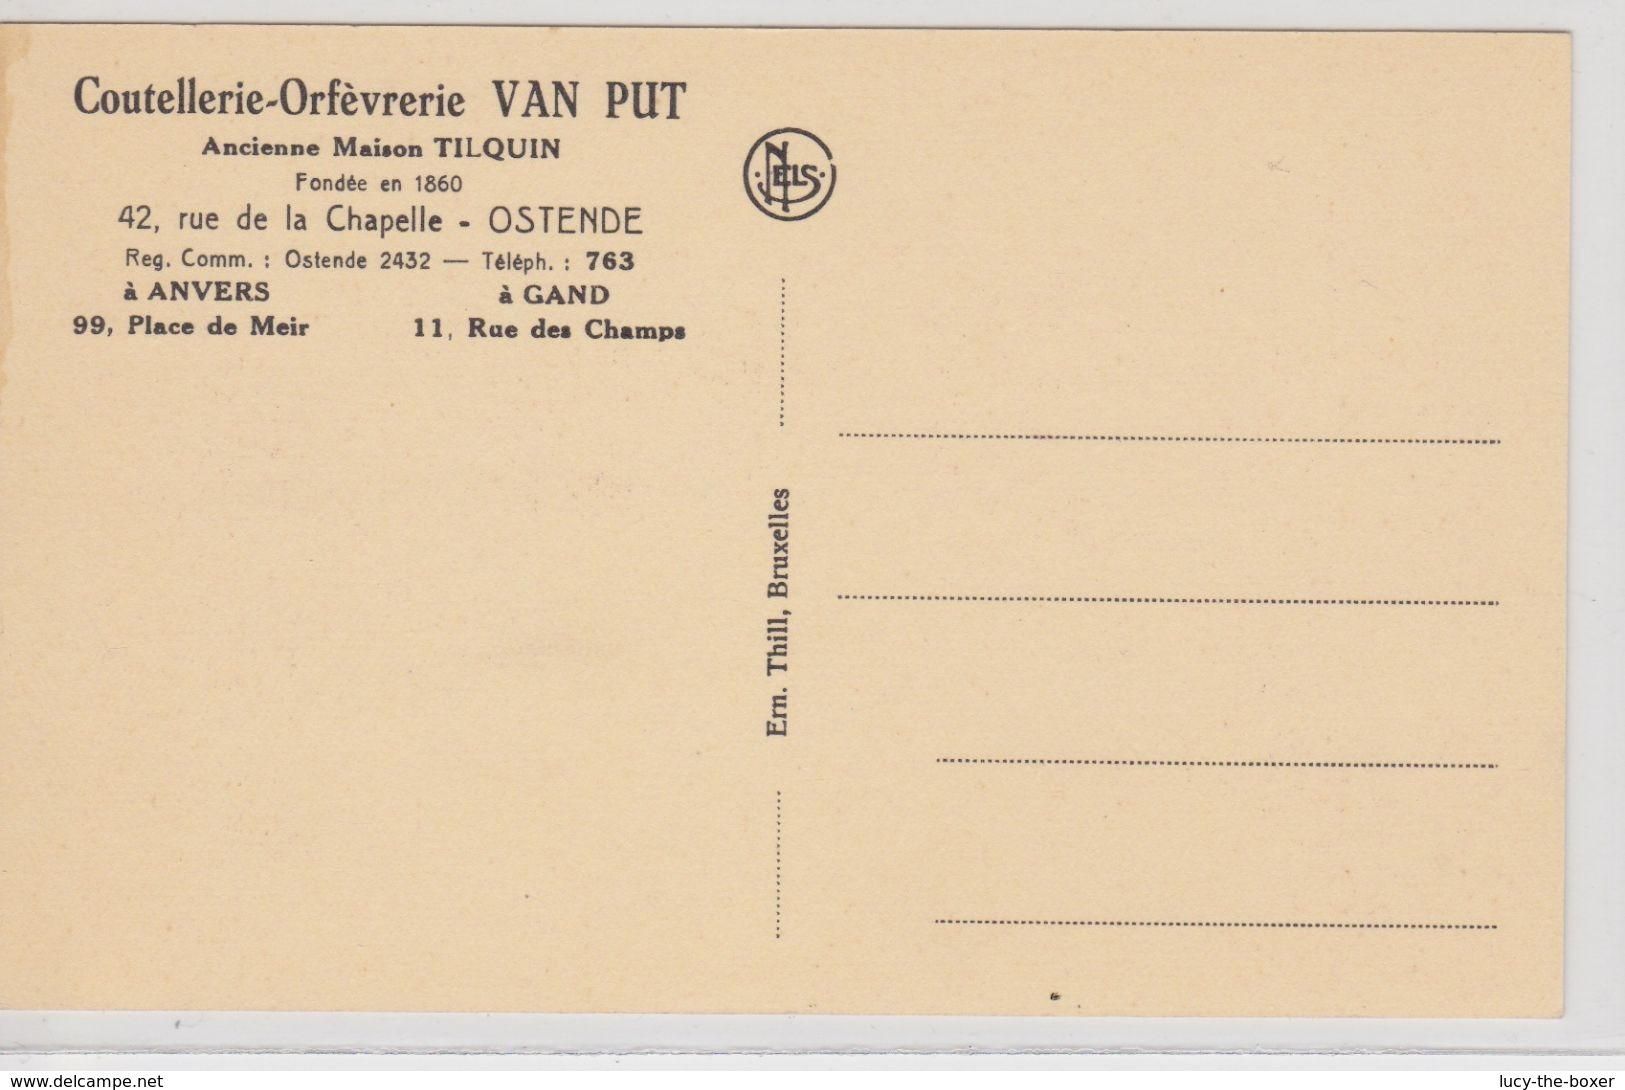 Ostende Coutellerie - Orfèvrerie VAN PUT - Oostende